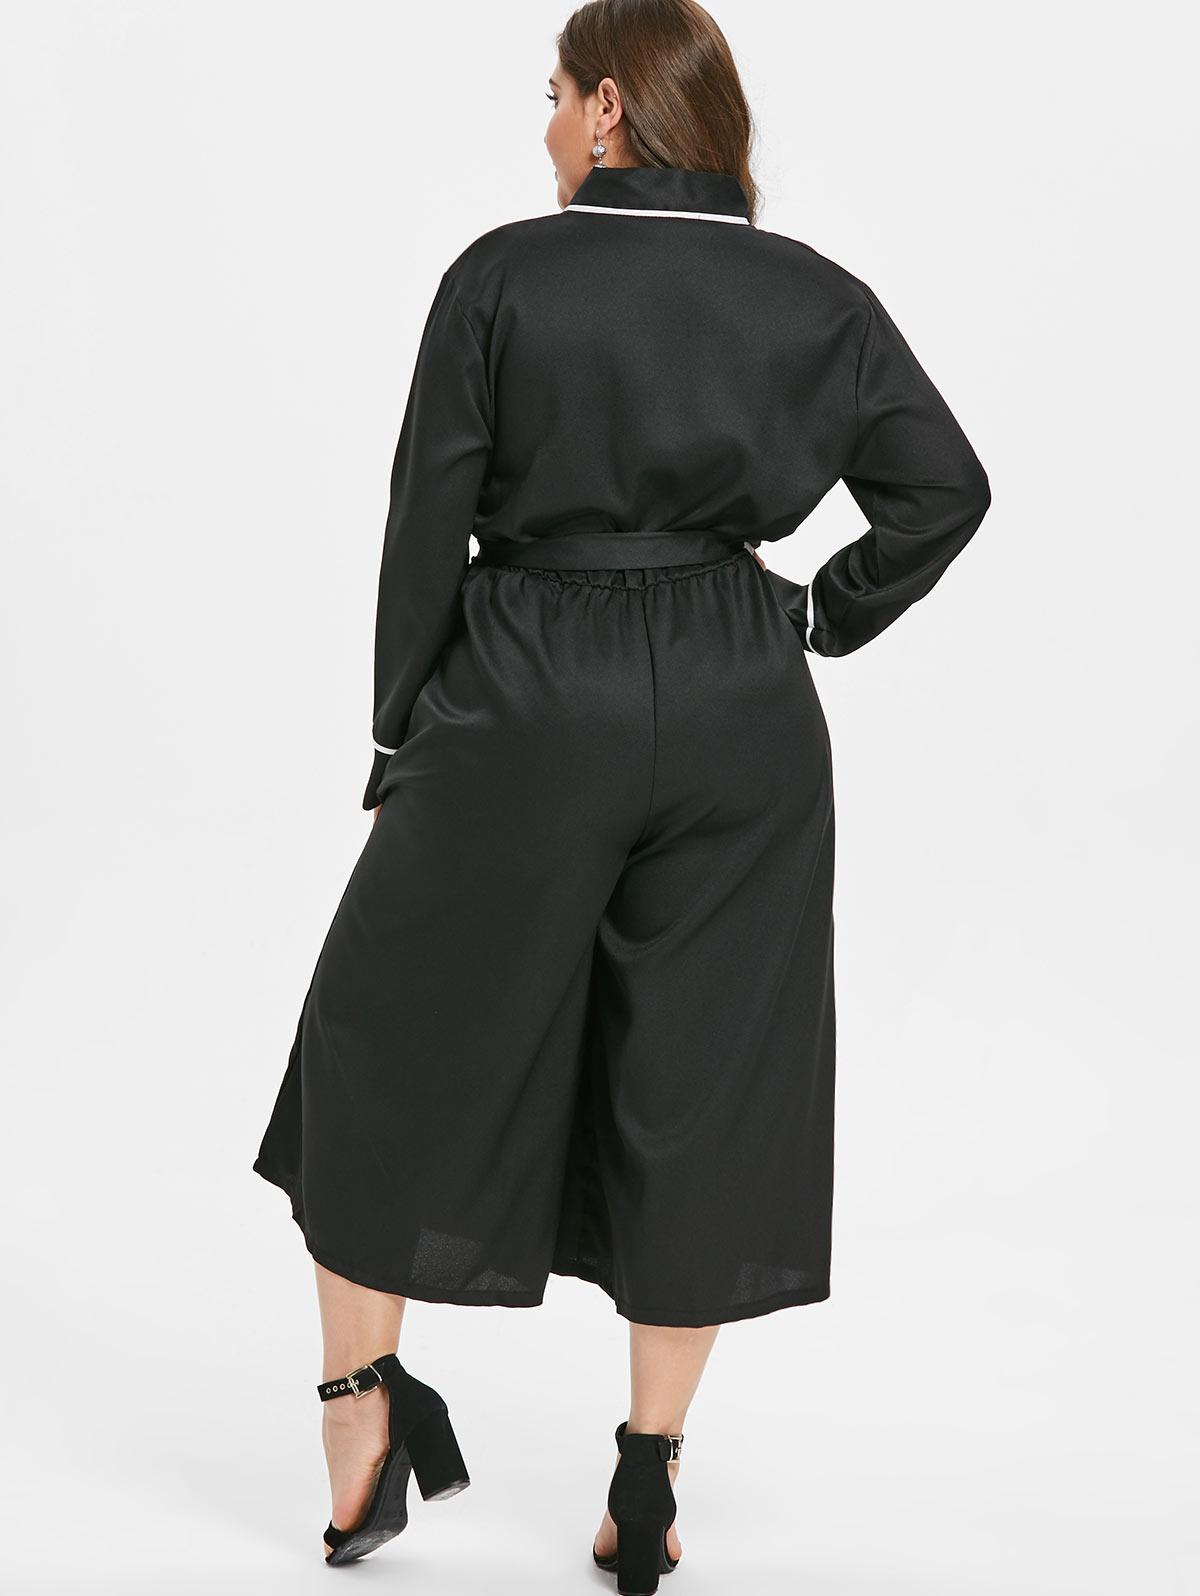 Wipalo Women Plus Size Long Sleeves Wide Leg Surplice Jumpsuit Japan Style Plunging Neck Bow Tied Belt Casual Solid Jumpsuit 4XL